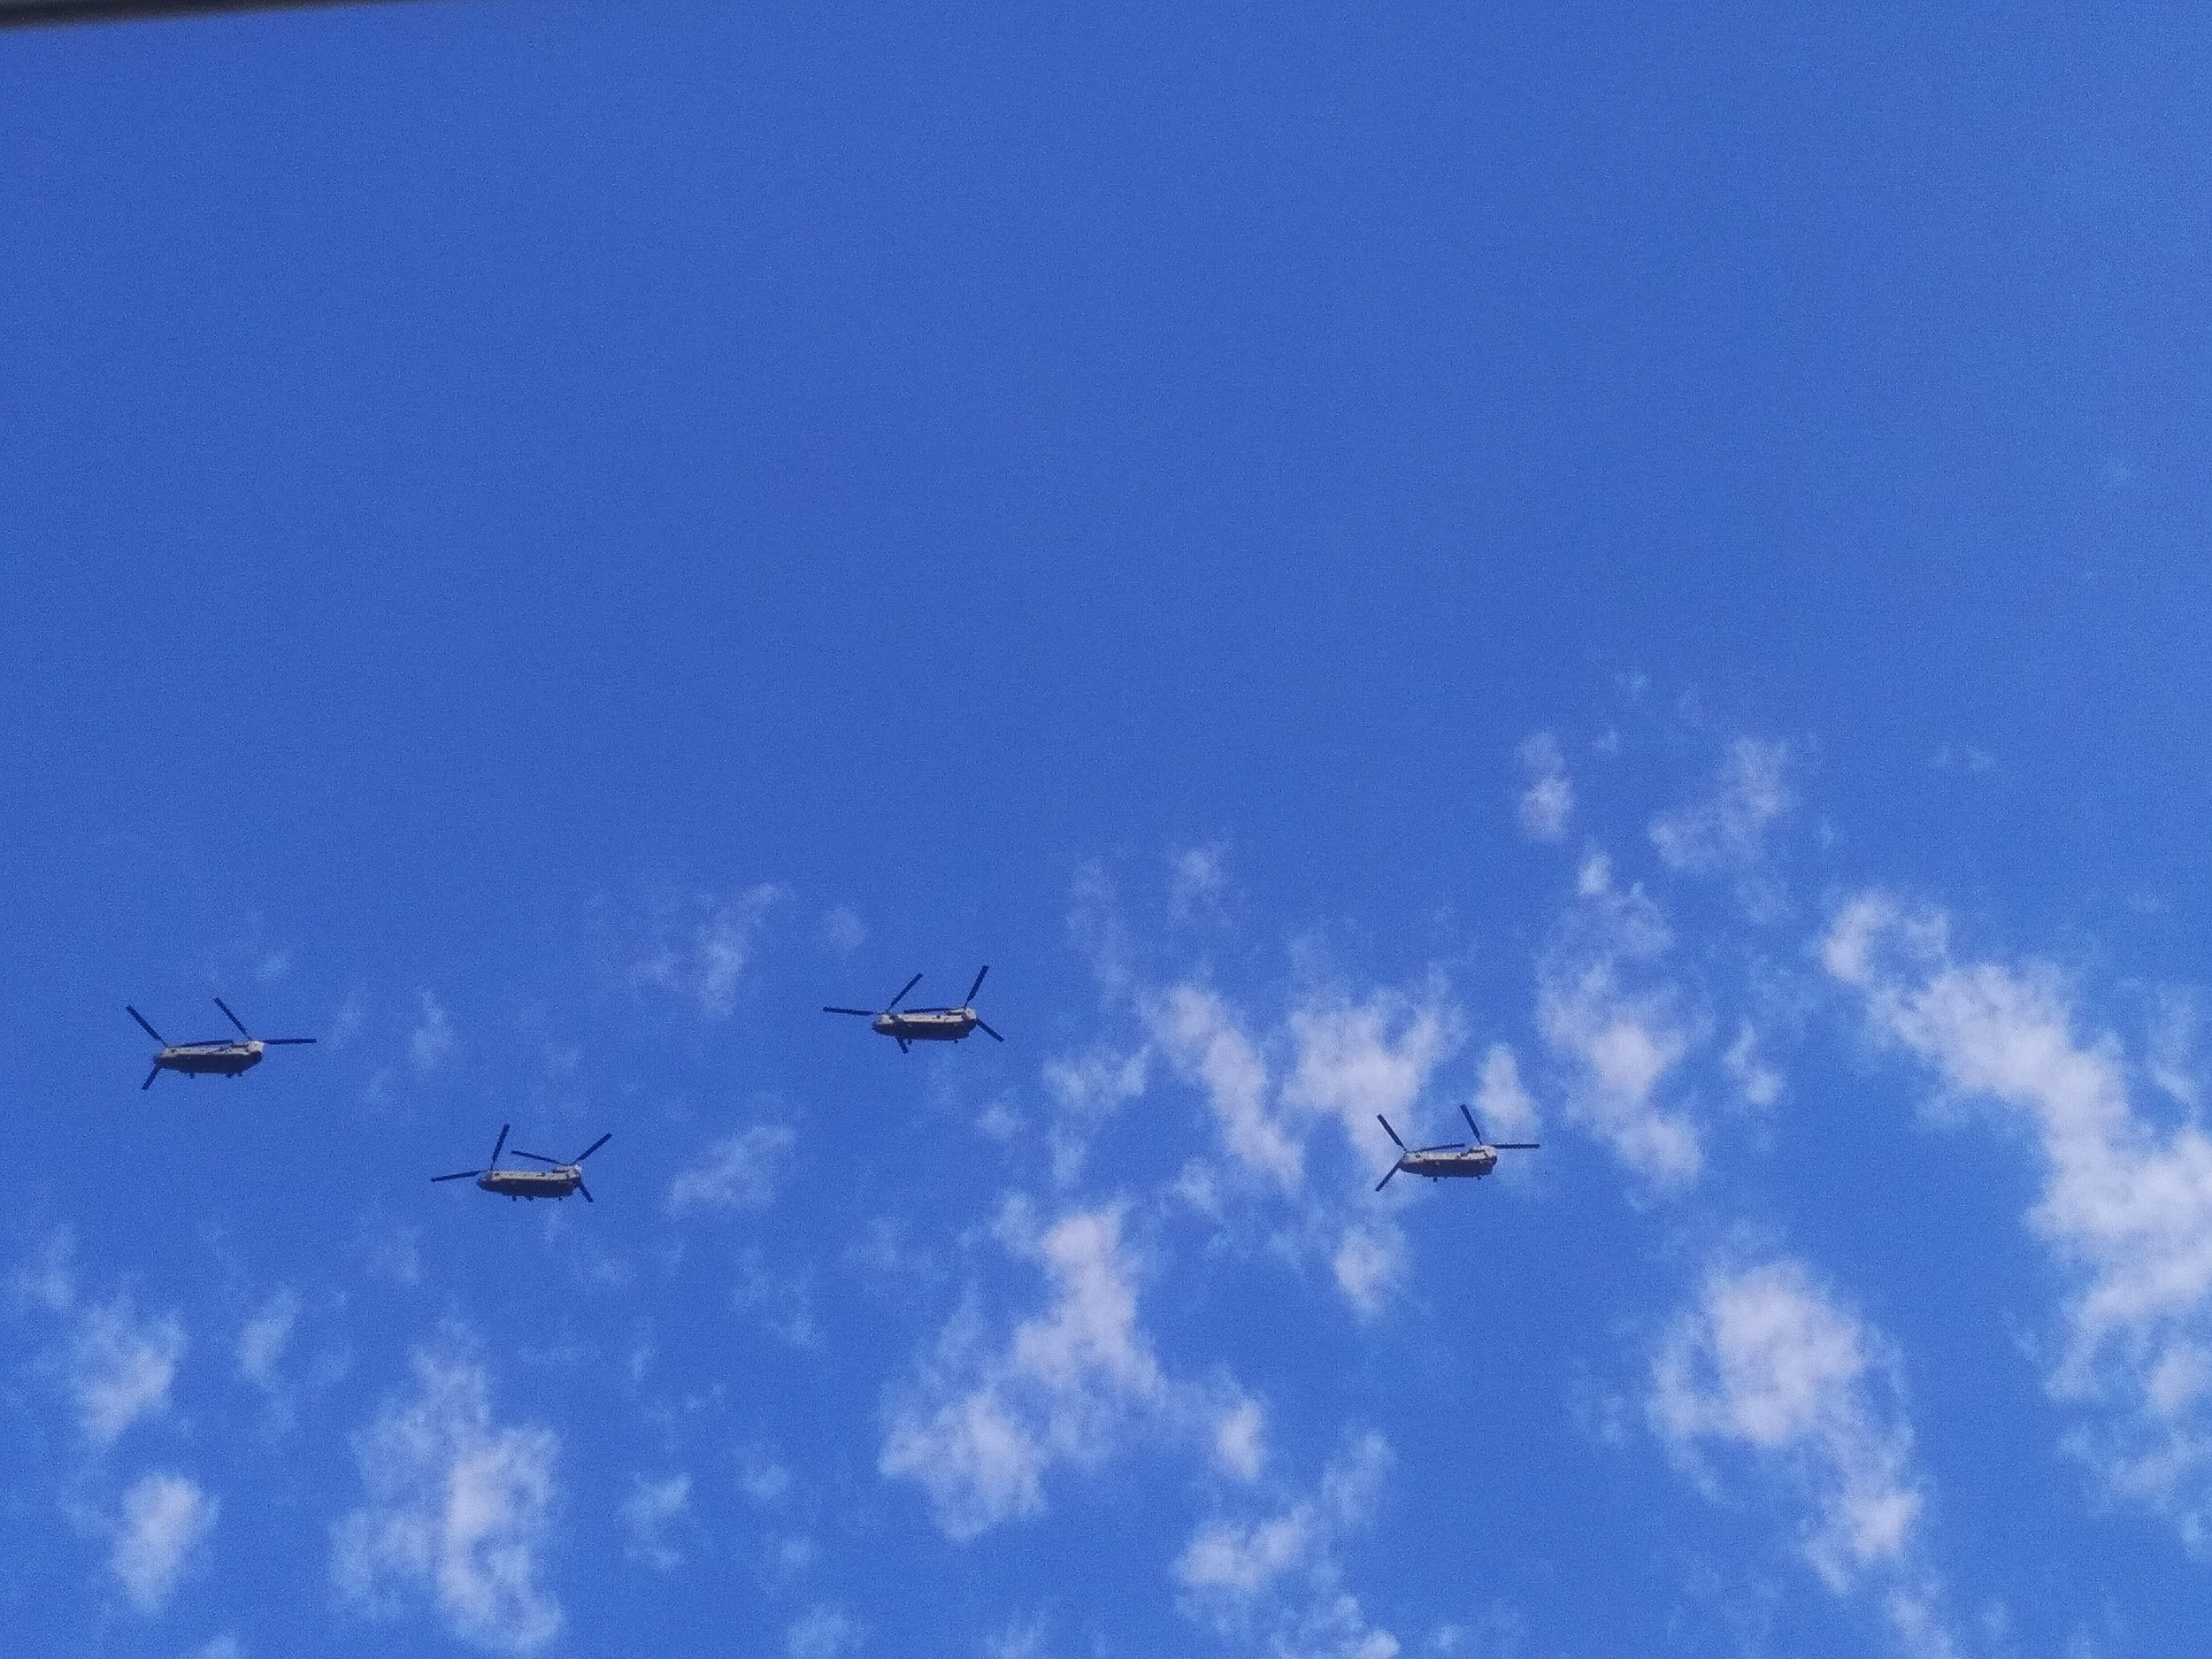 4 Chinook vole au-dessus de la Seine